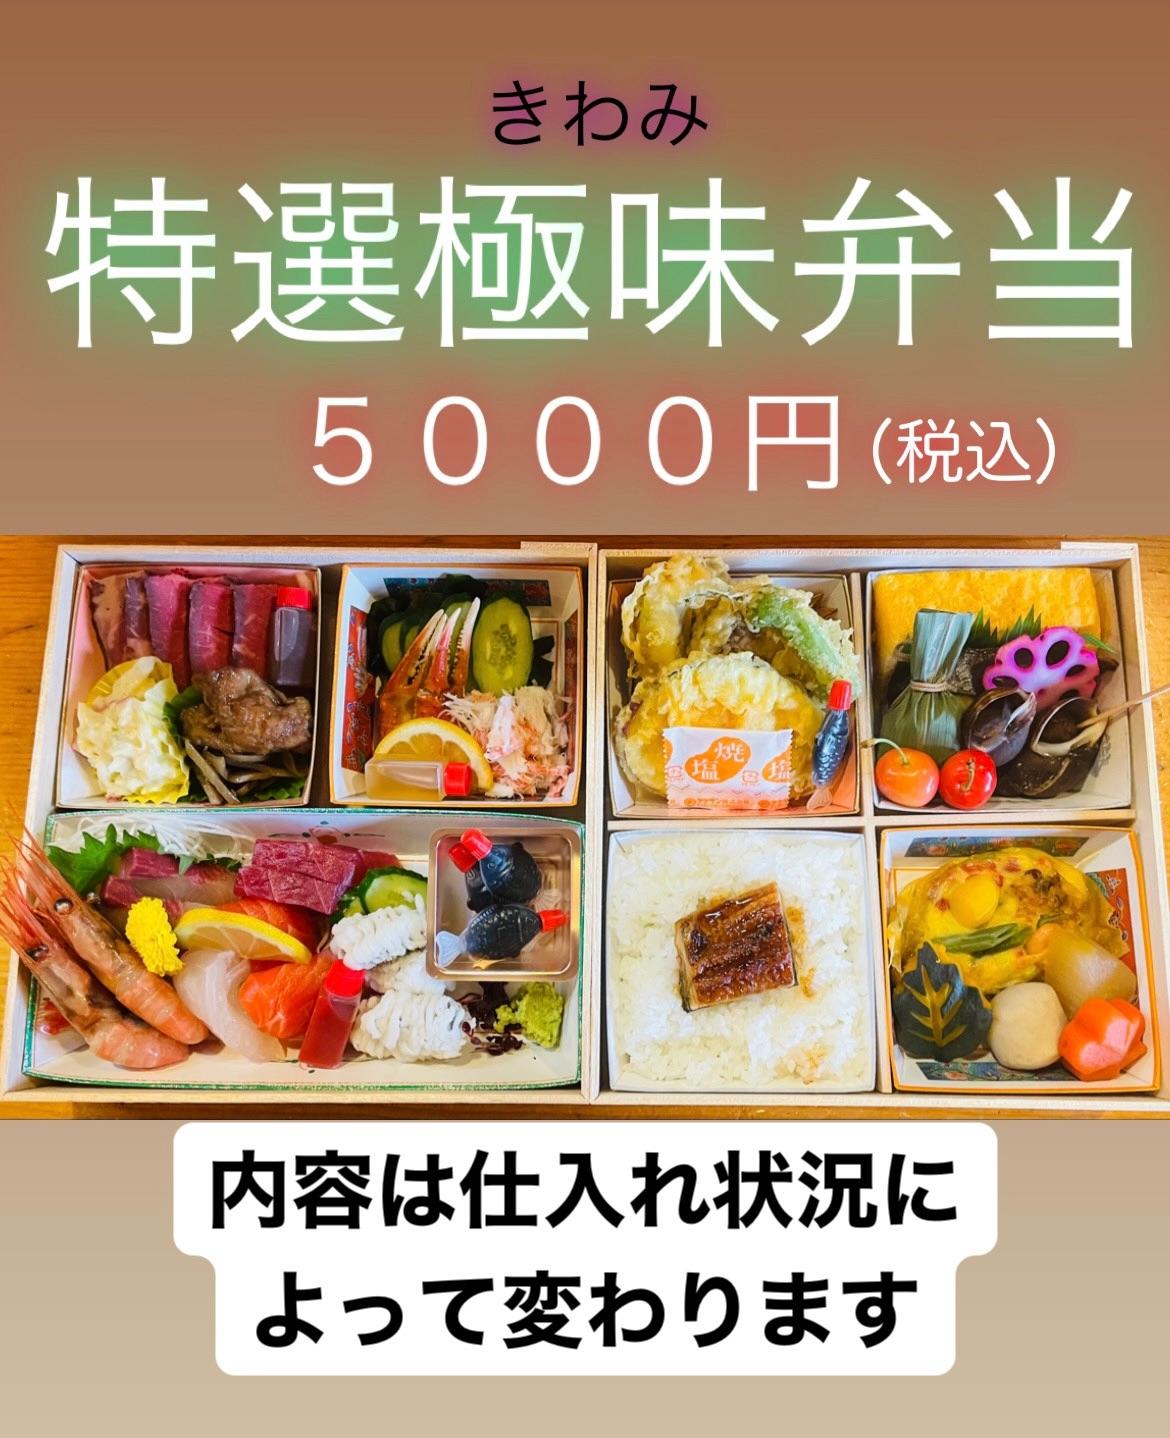 f:id:carp_0301_kenta:20210721225605j:image